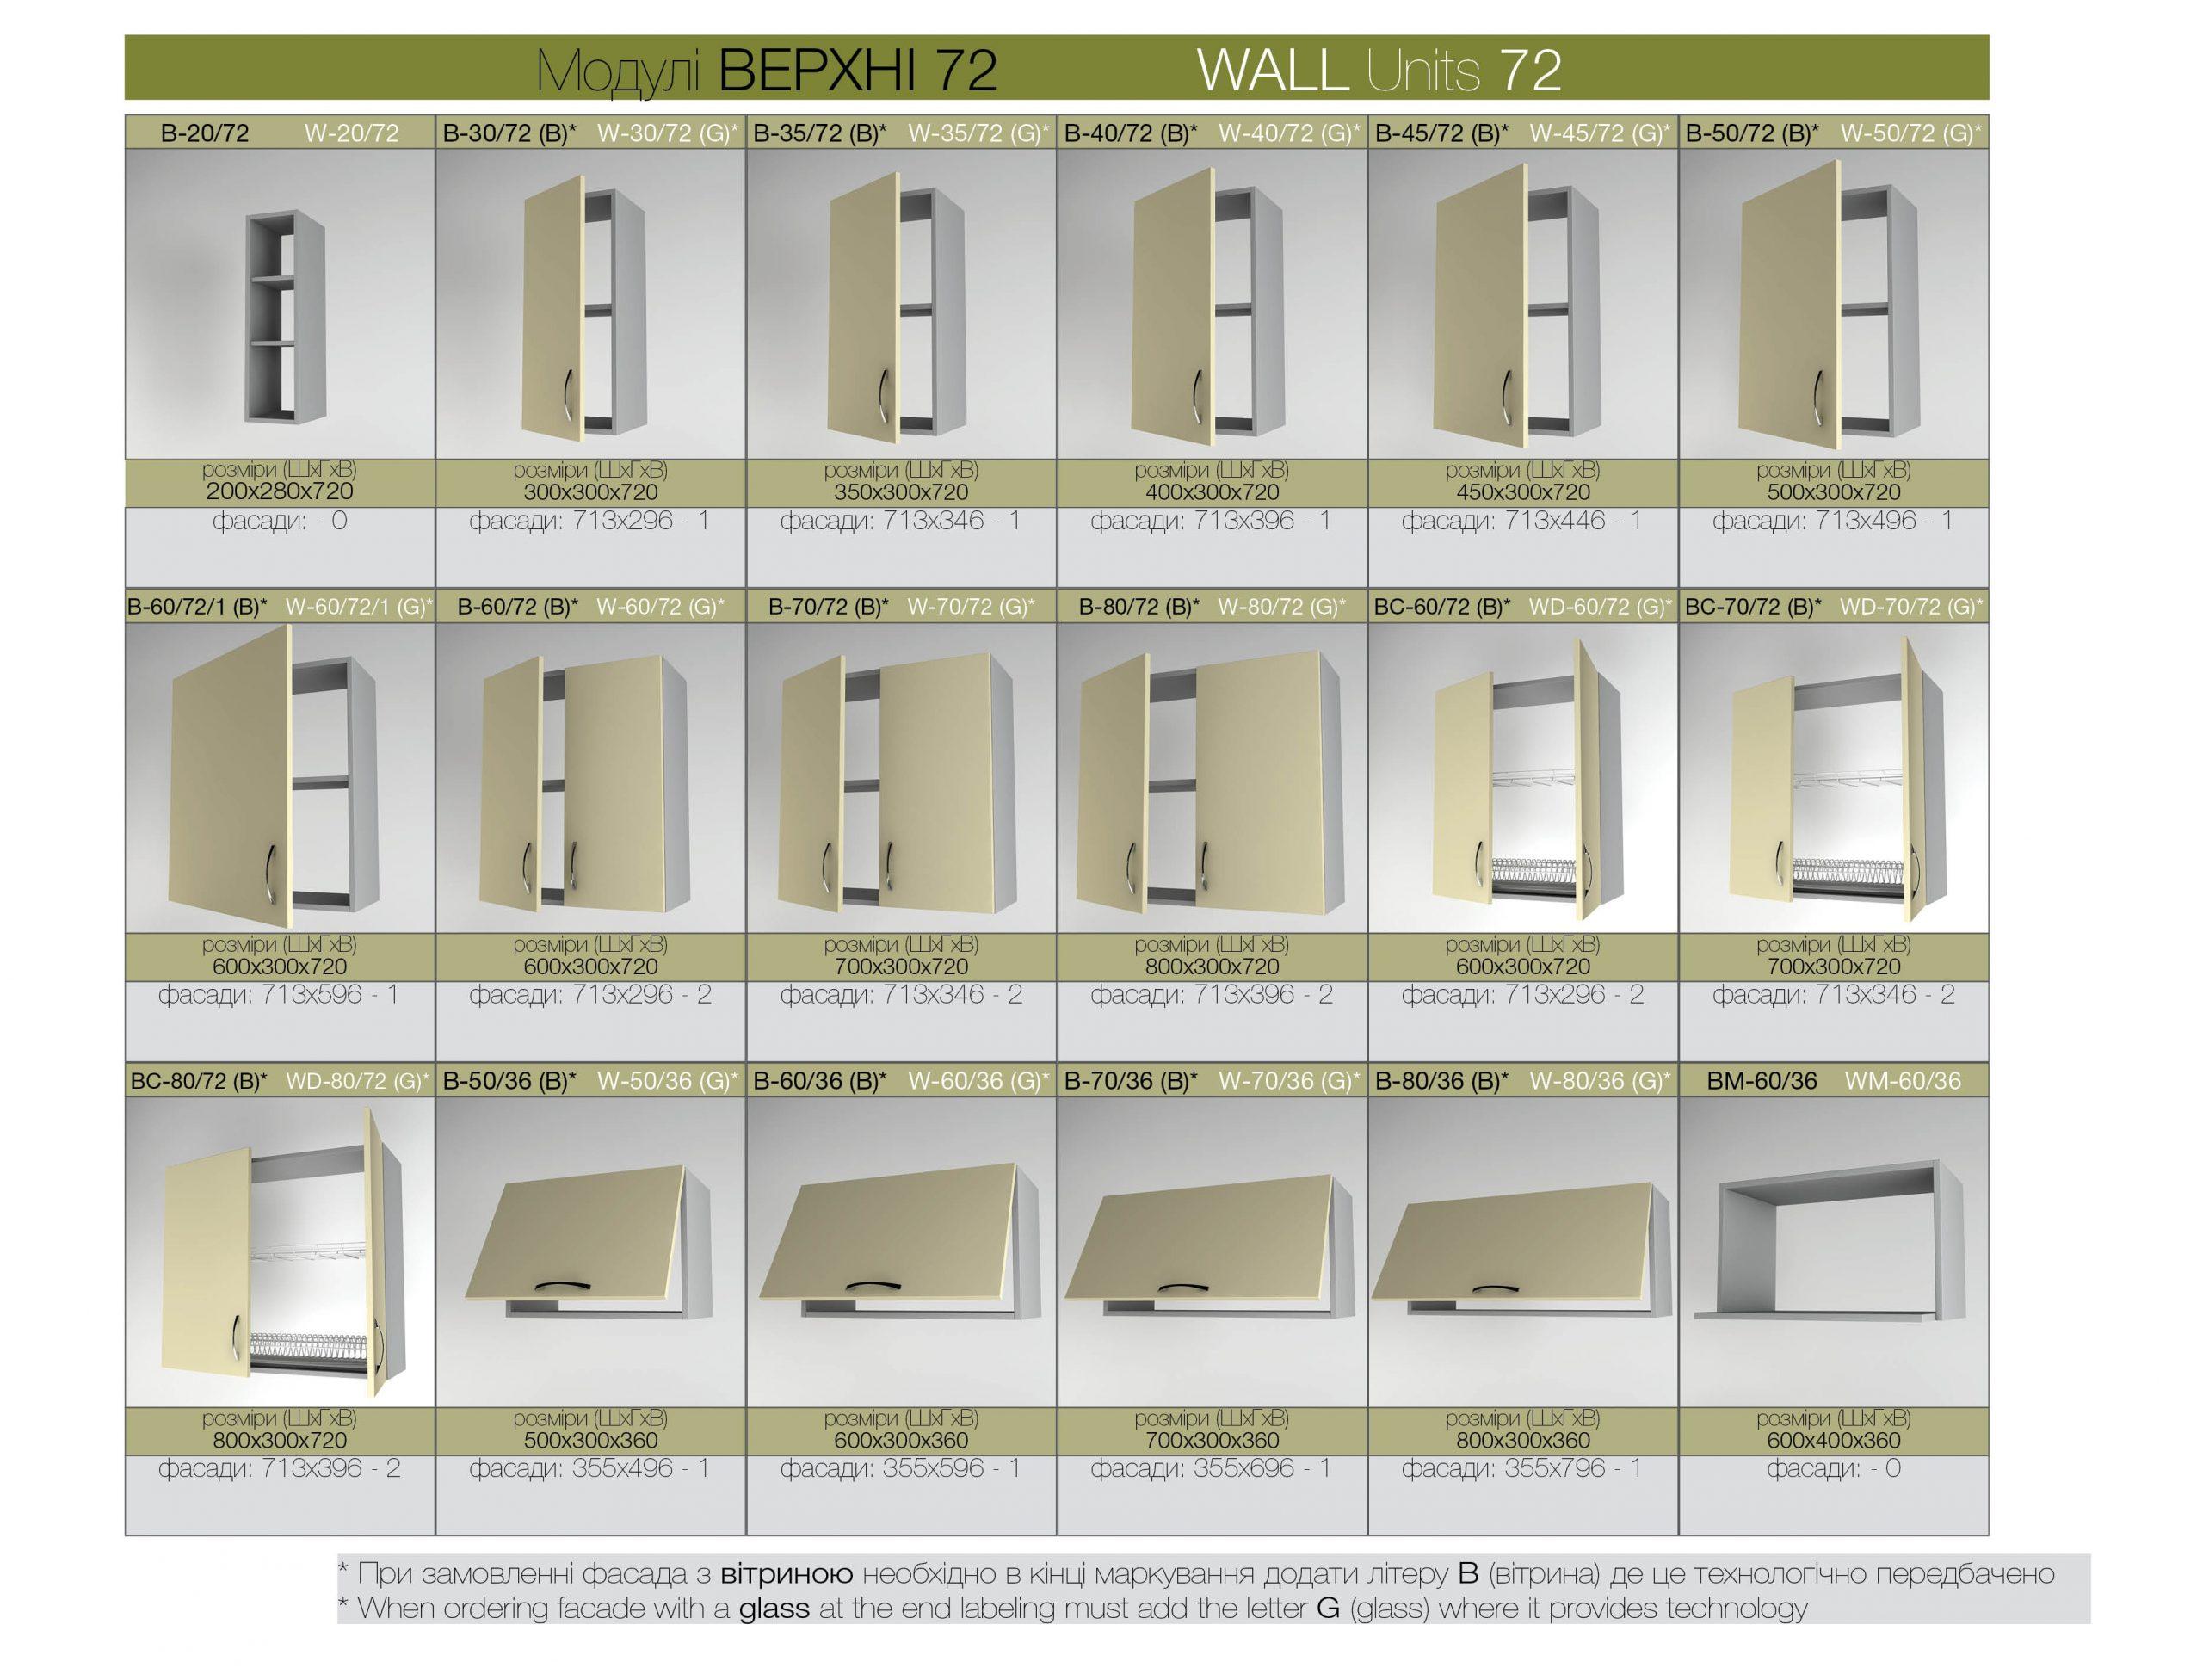 wall_units_01